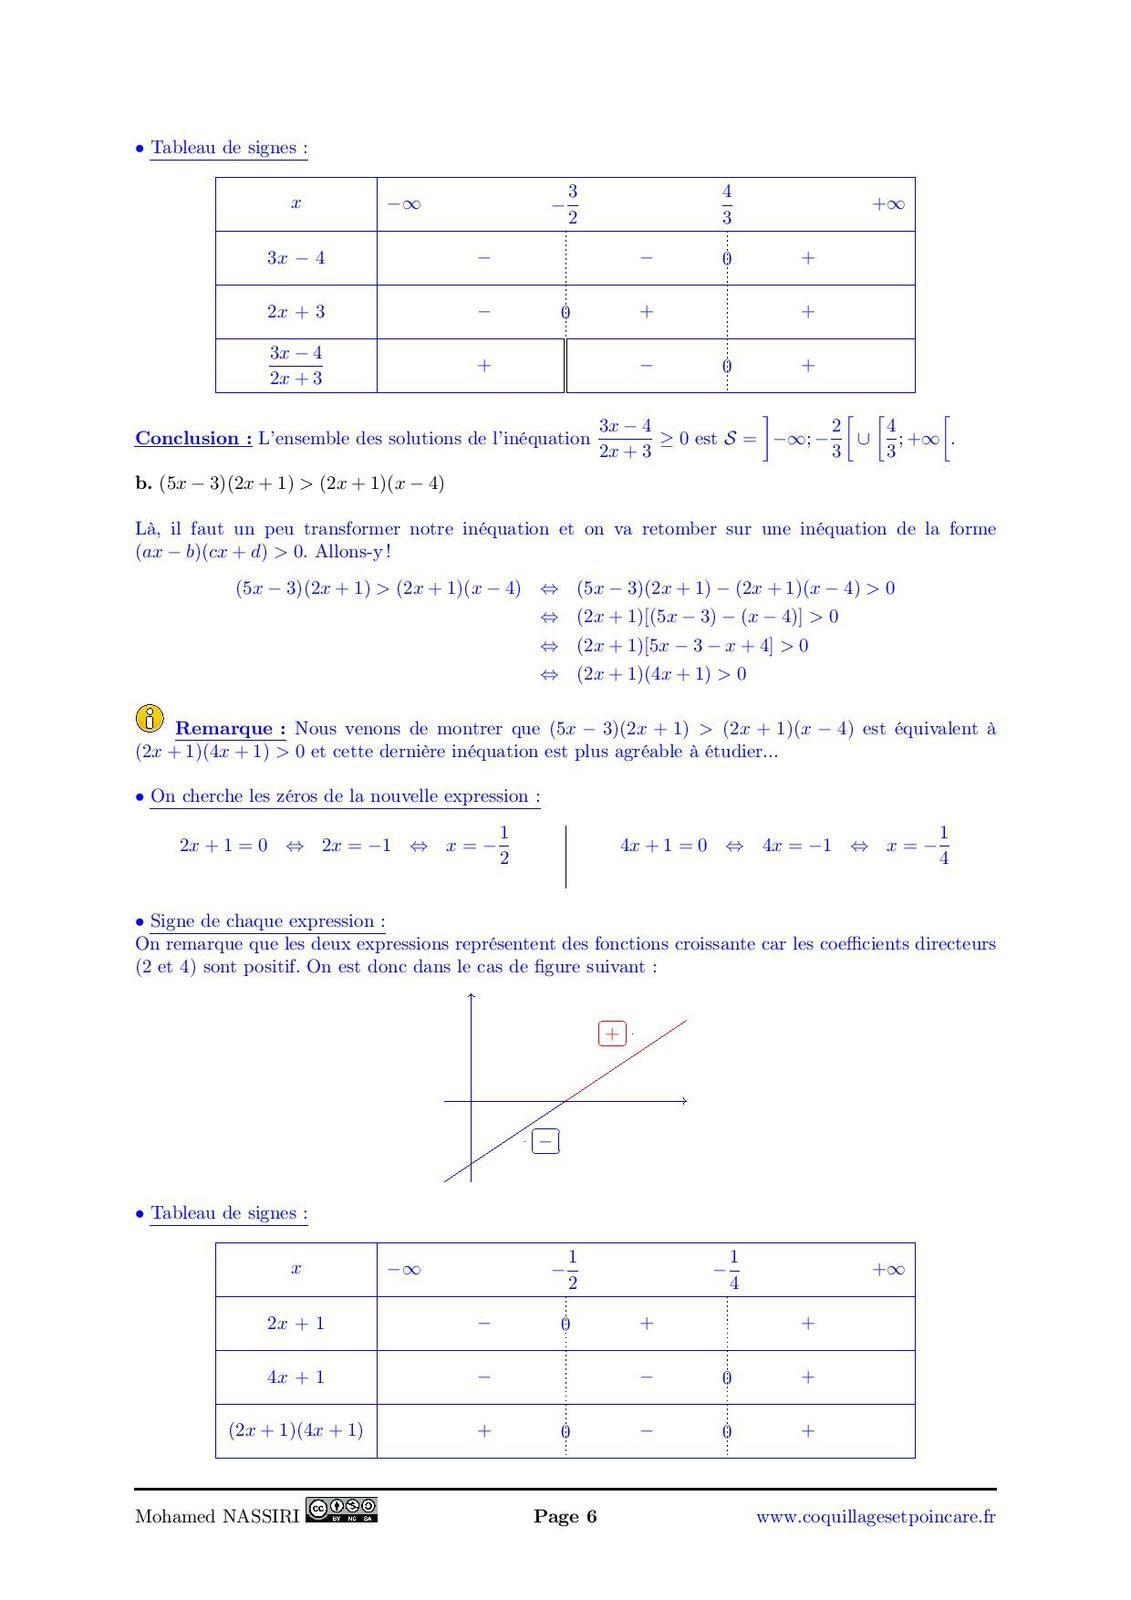 Corvée n°12 - Correction Corvée n°12